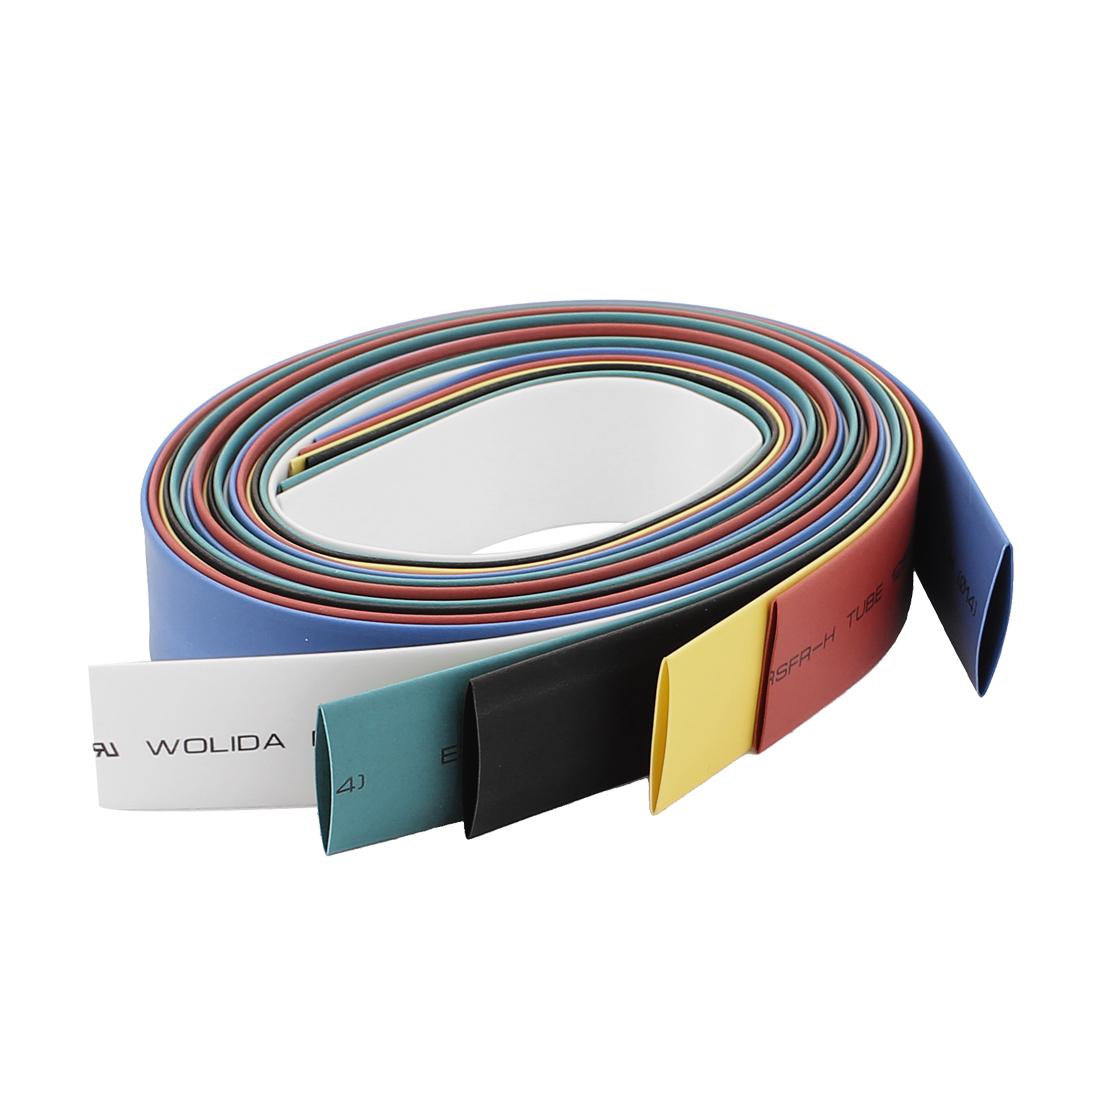 14mm Dia Heat Shrink Tubing Shrinking Tube Sleeve Wrap Wire 3.2Ft 6pcs